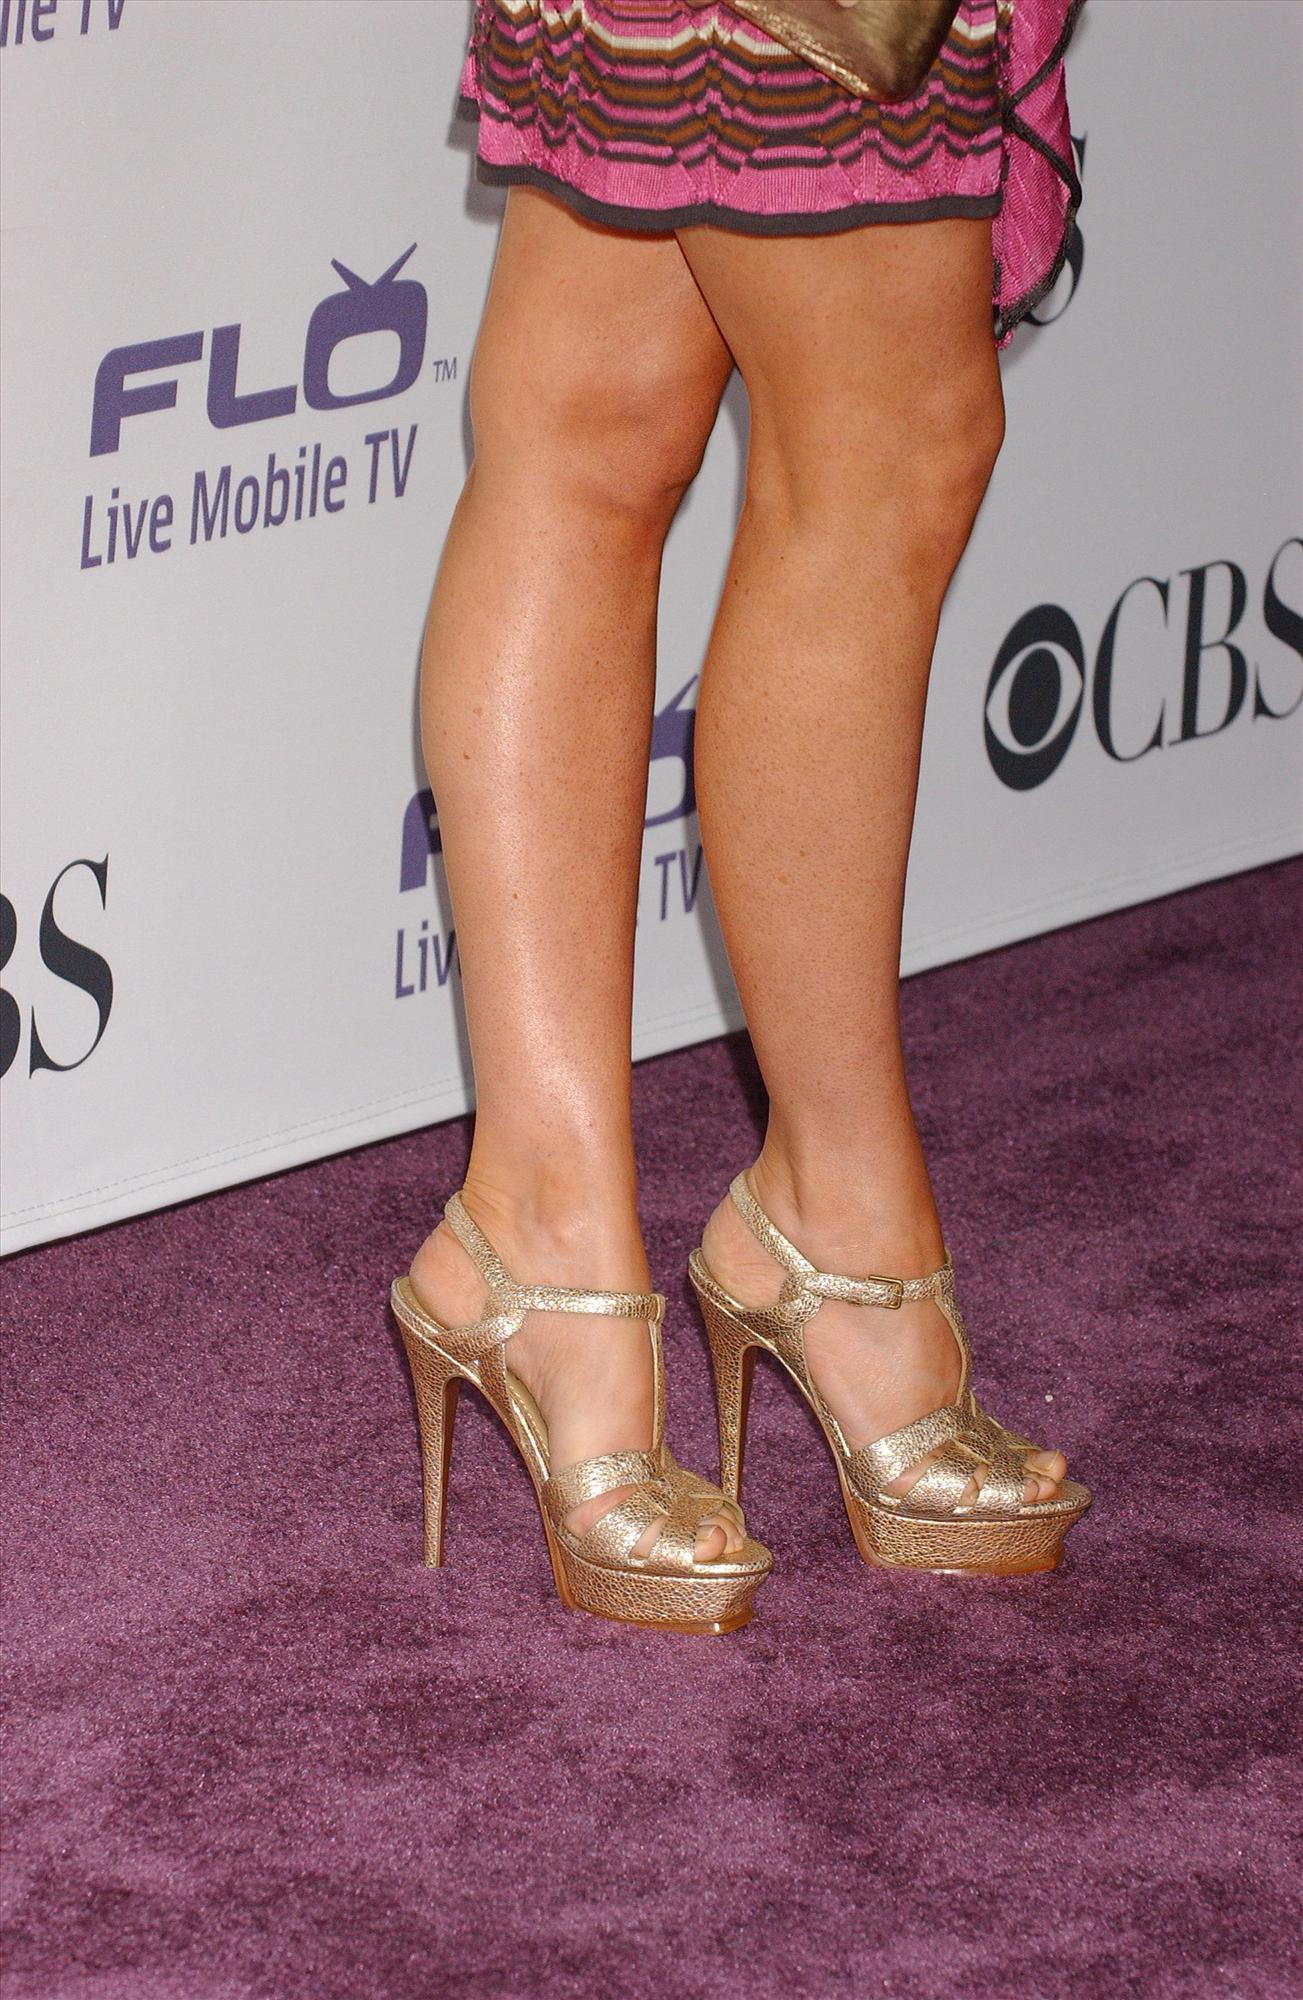 Alyson Hannigan S Feet